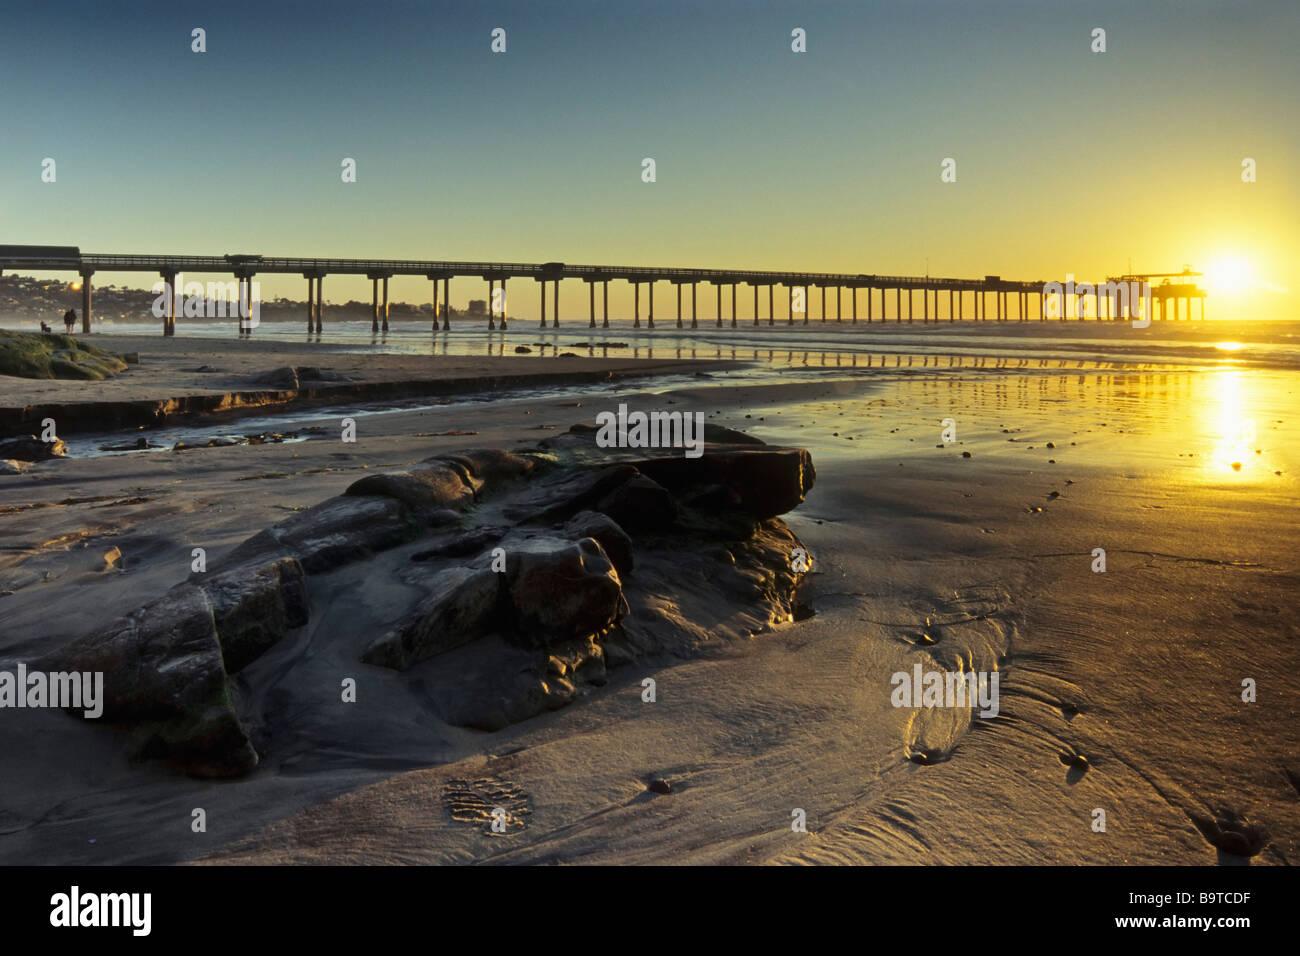 Pier of Scripps Institute of Oceanography La Jolla Beach San Diego CA USA - Stock Image